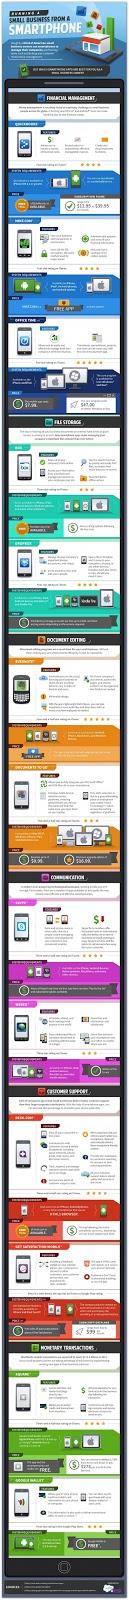 Business Apps for Busy Entrepreneurs